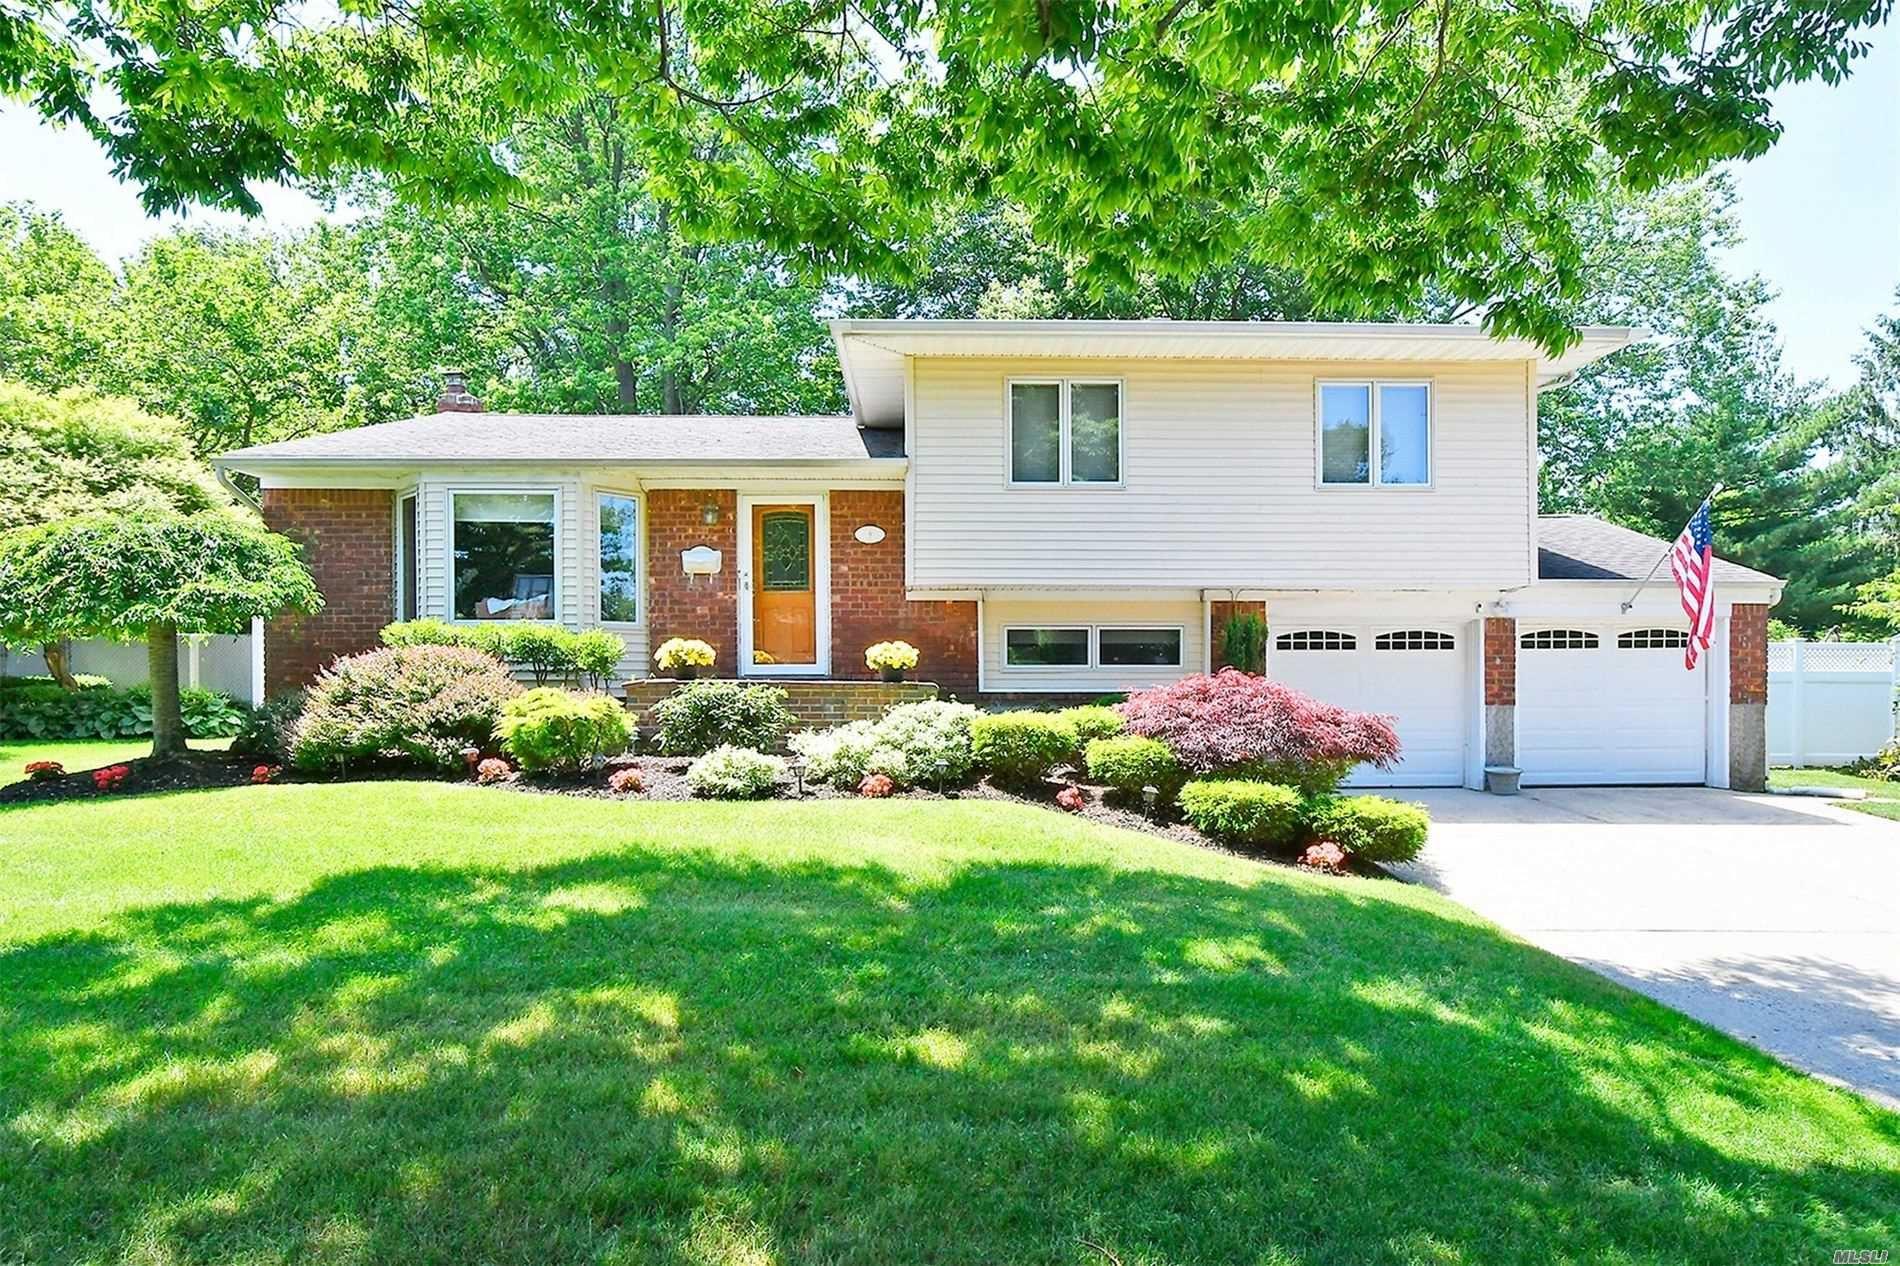 9 Weldon Lane, Old Bethpage, NY 11804 - MLS#: 3227062